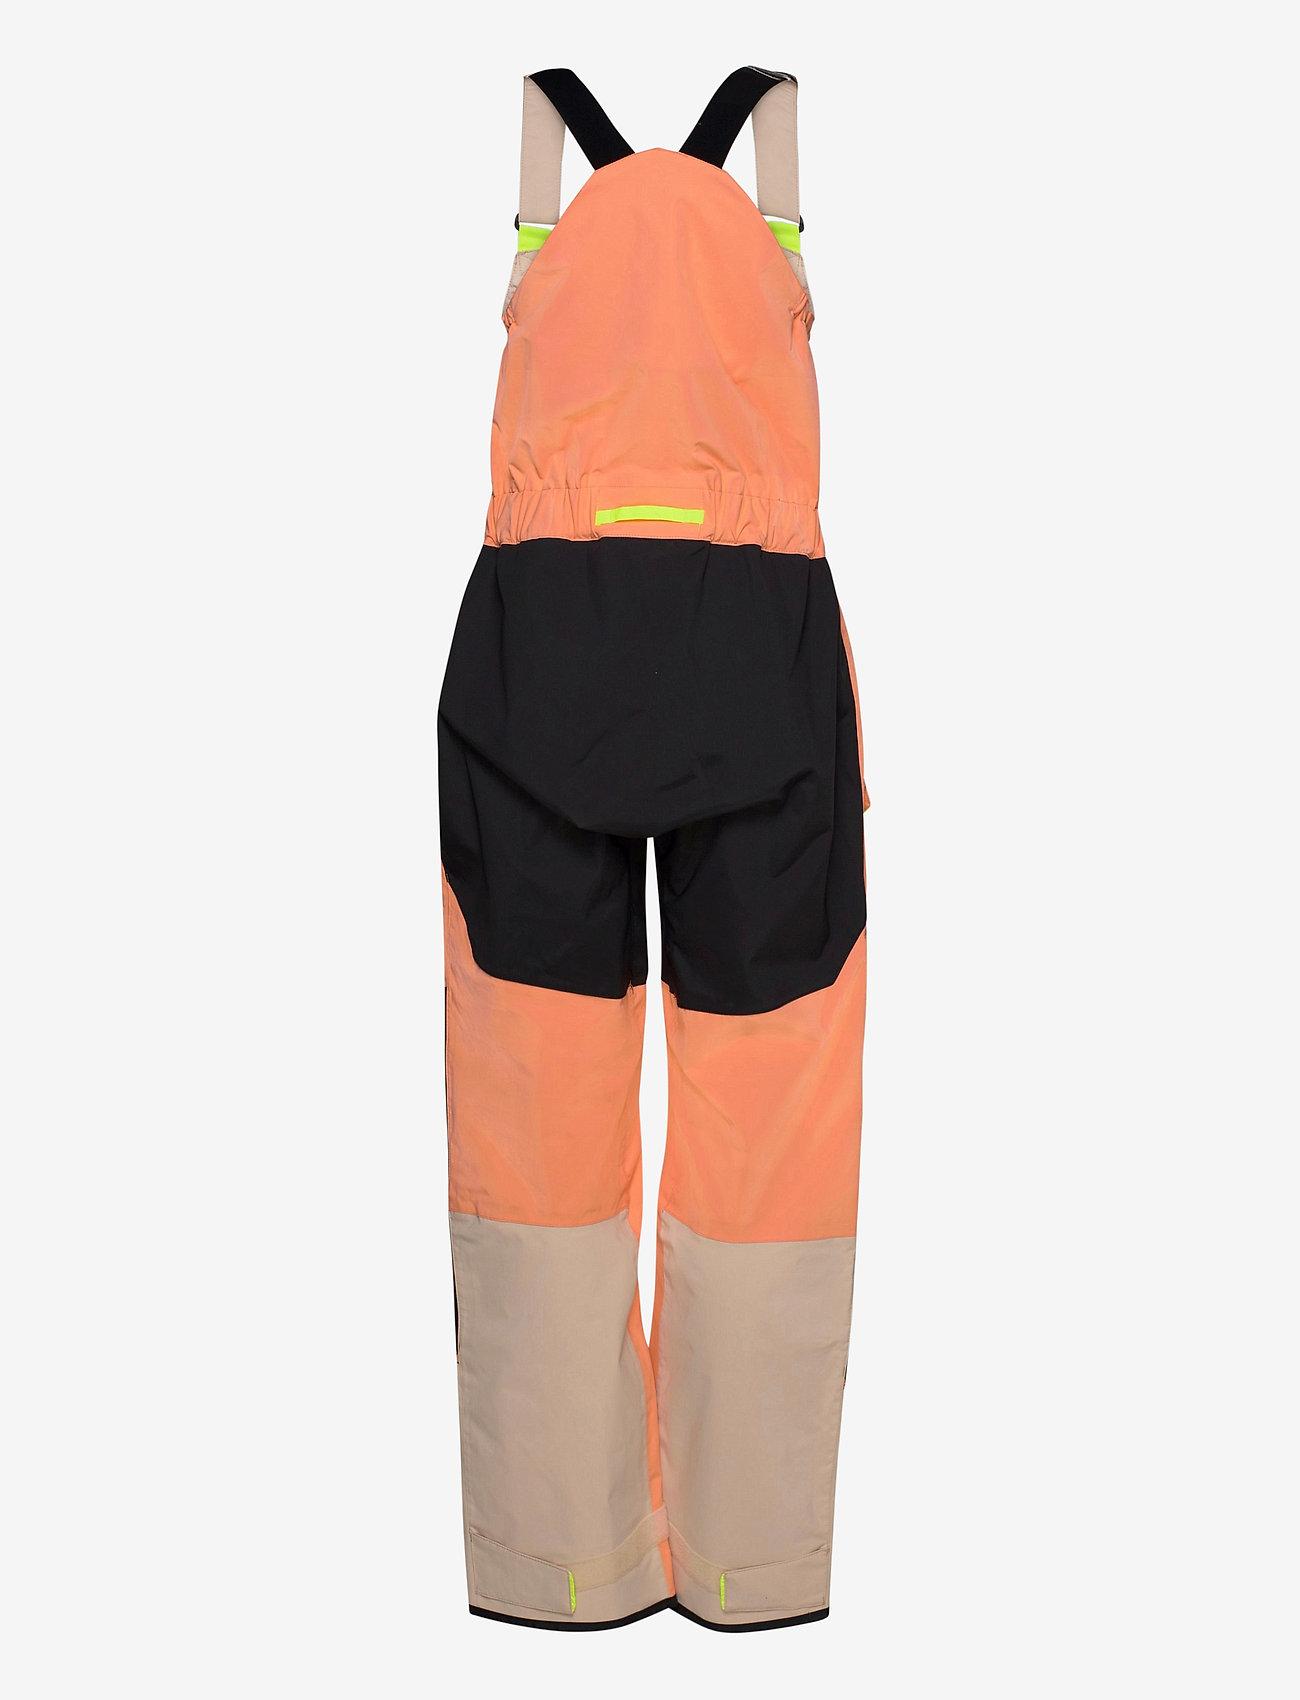 Helly Hansen - W PIER BIB - pantalon de randonnée - melon - 1